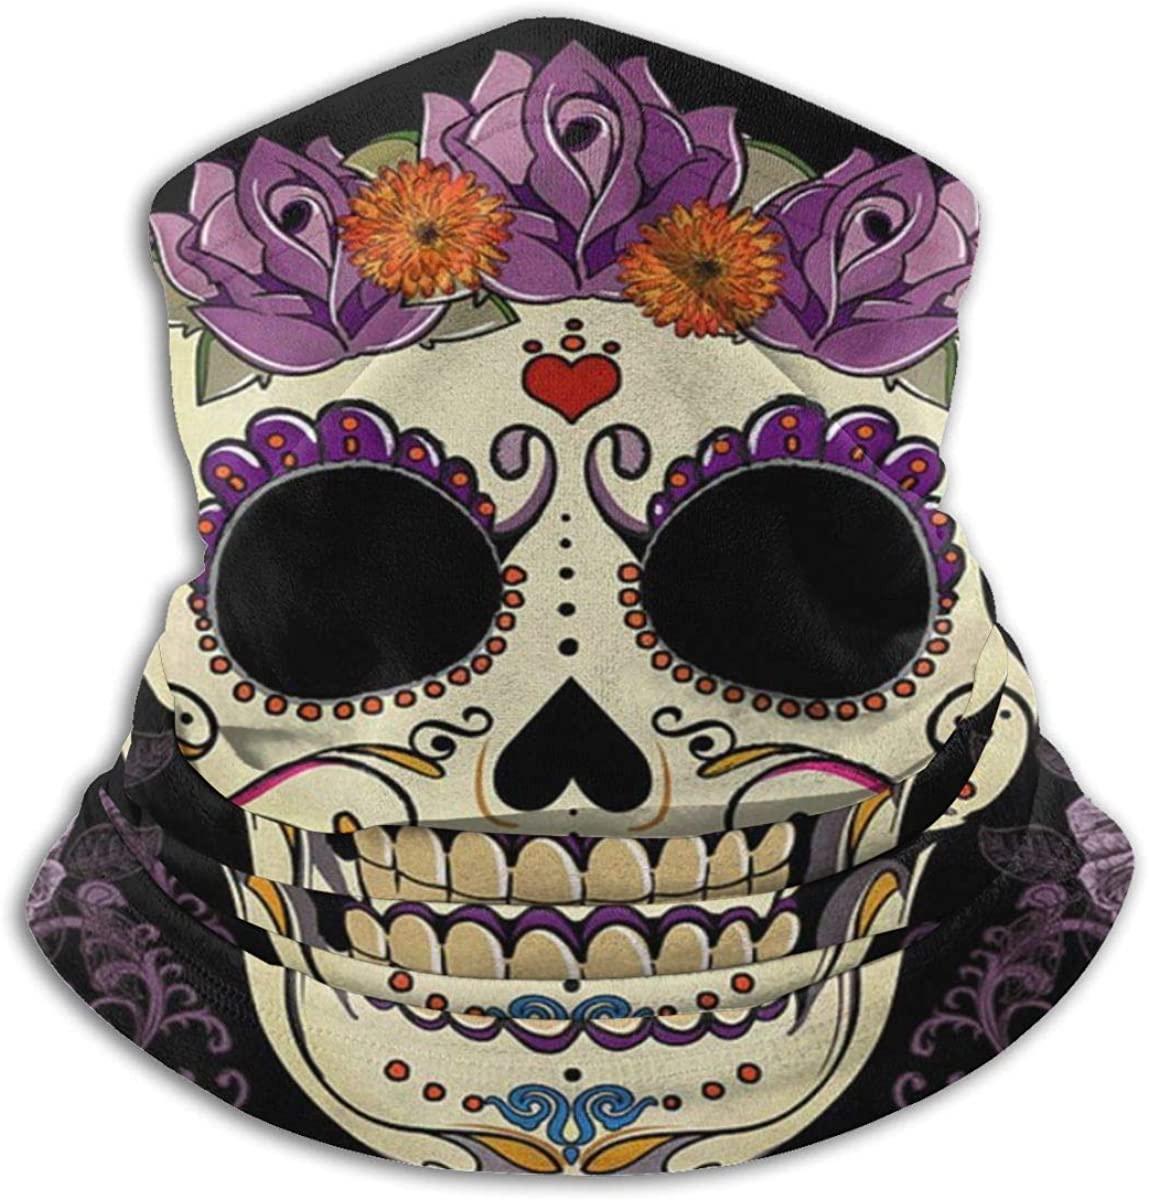 Face Mask, Neck Gaiter, Vintage Sugar Skull Bandana, Balaclava Windproof,Anti Dust Magic Scarf for Women Men